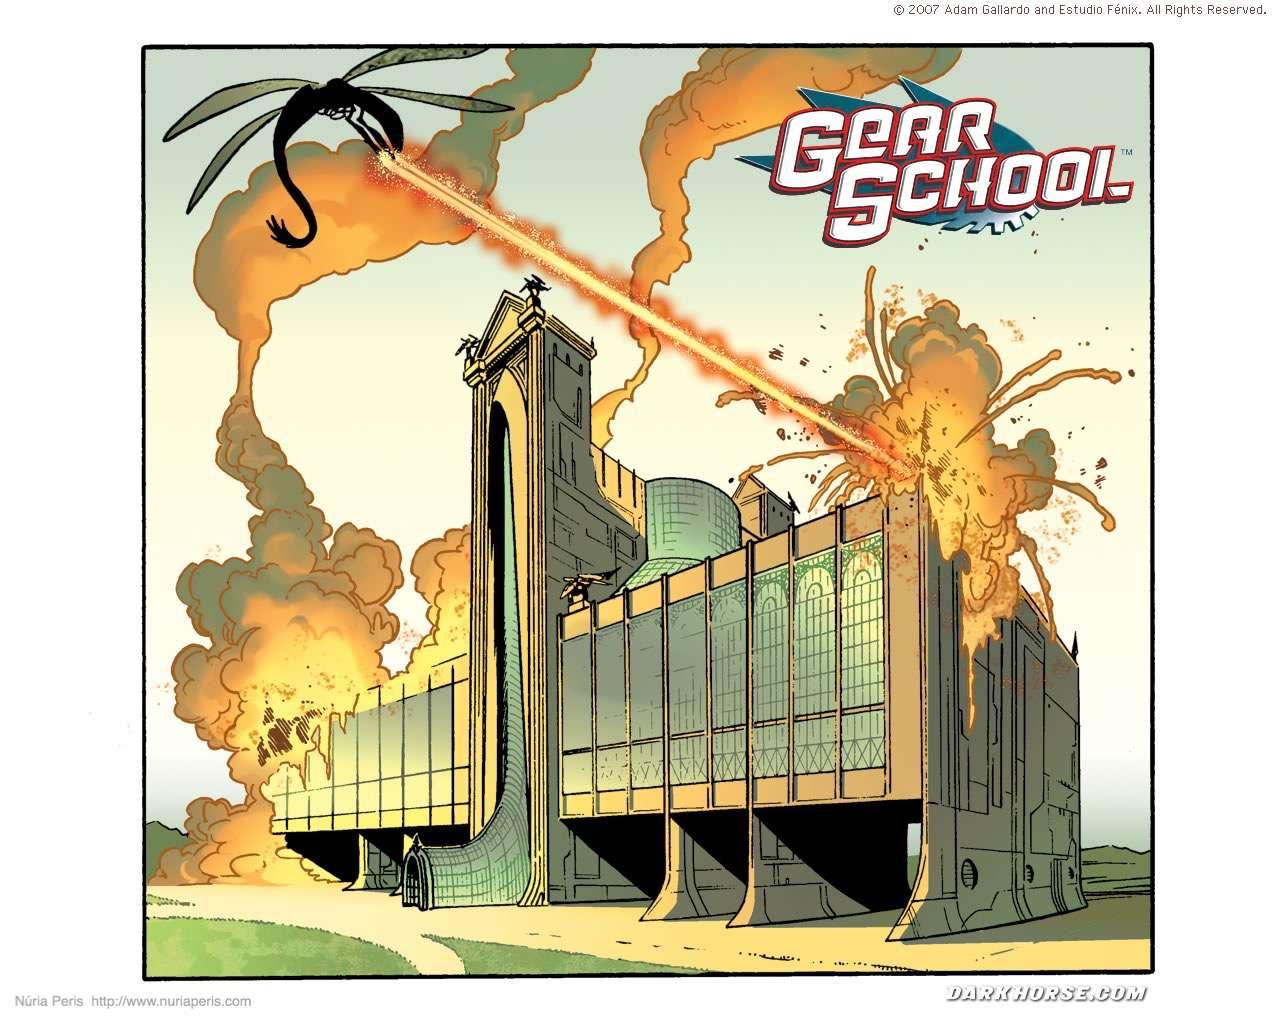 ©Dark Horse Comics, Inc. / Adam Gallardo / Estudio Fénix